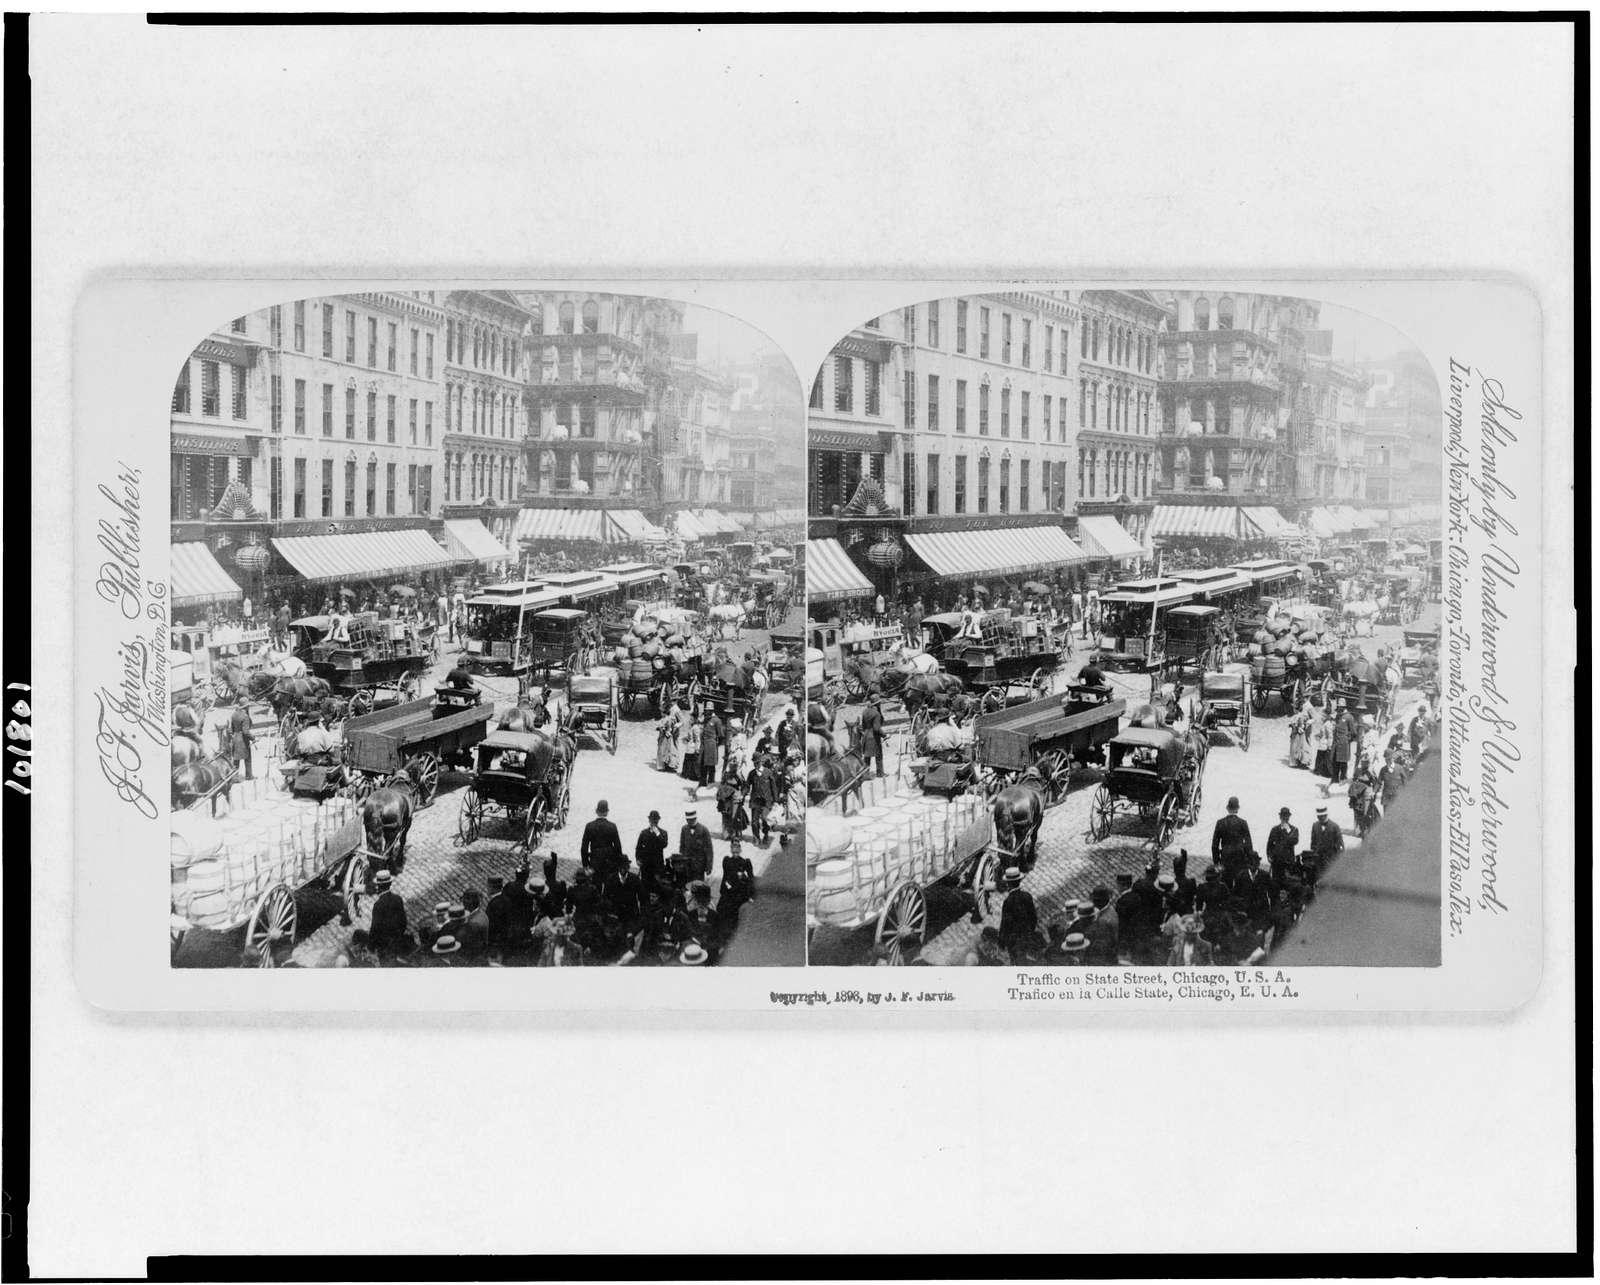 Traffic on State Street, Chicago, U.S.A. =Trafico en la Calle State, Chicago, E.U.A.